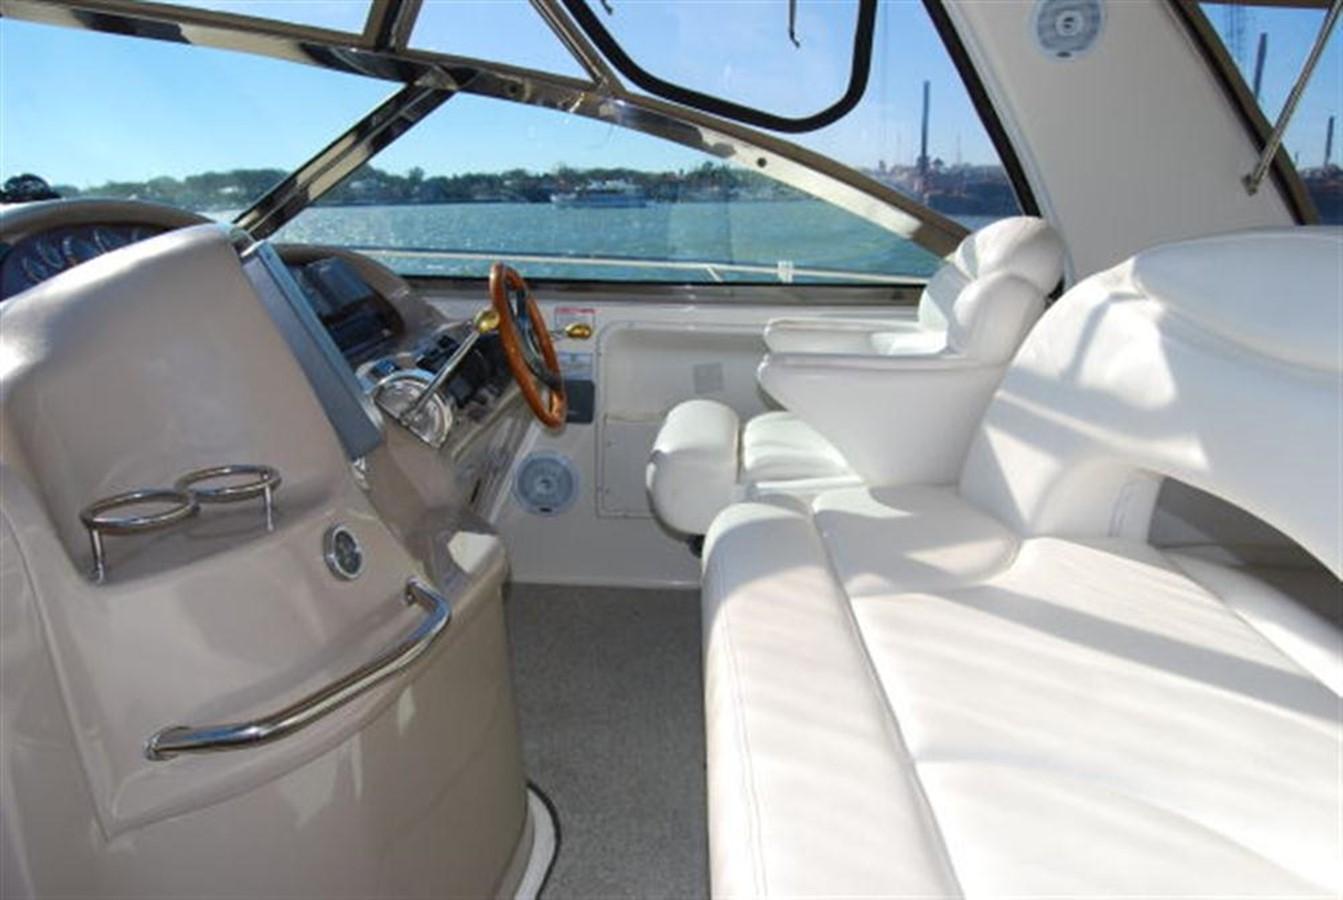 Helm Seat 2000 SEA RAY 410 Sundancer Cruiser 88070